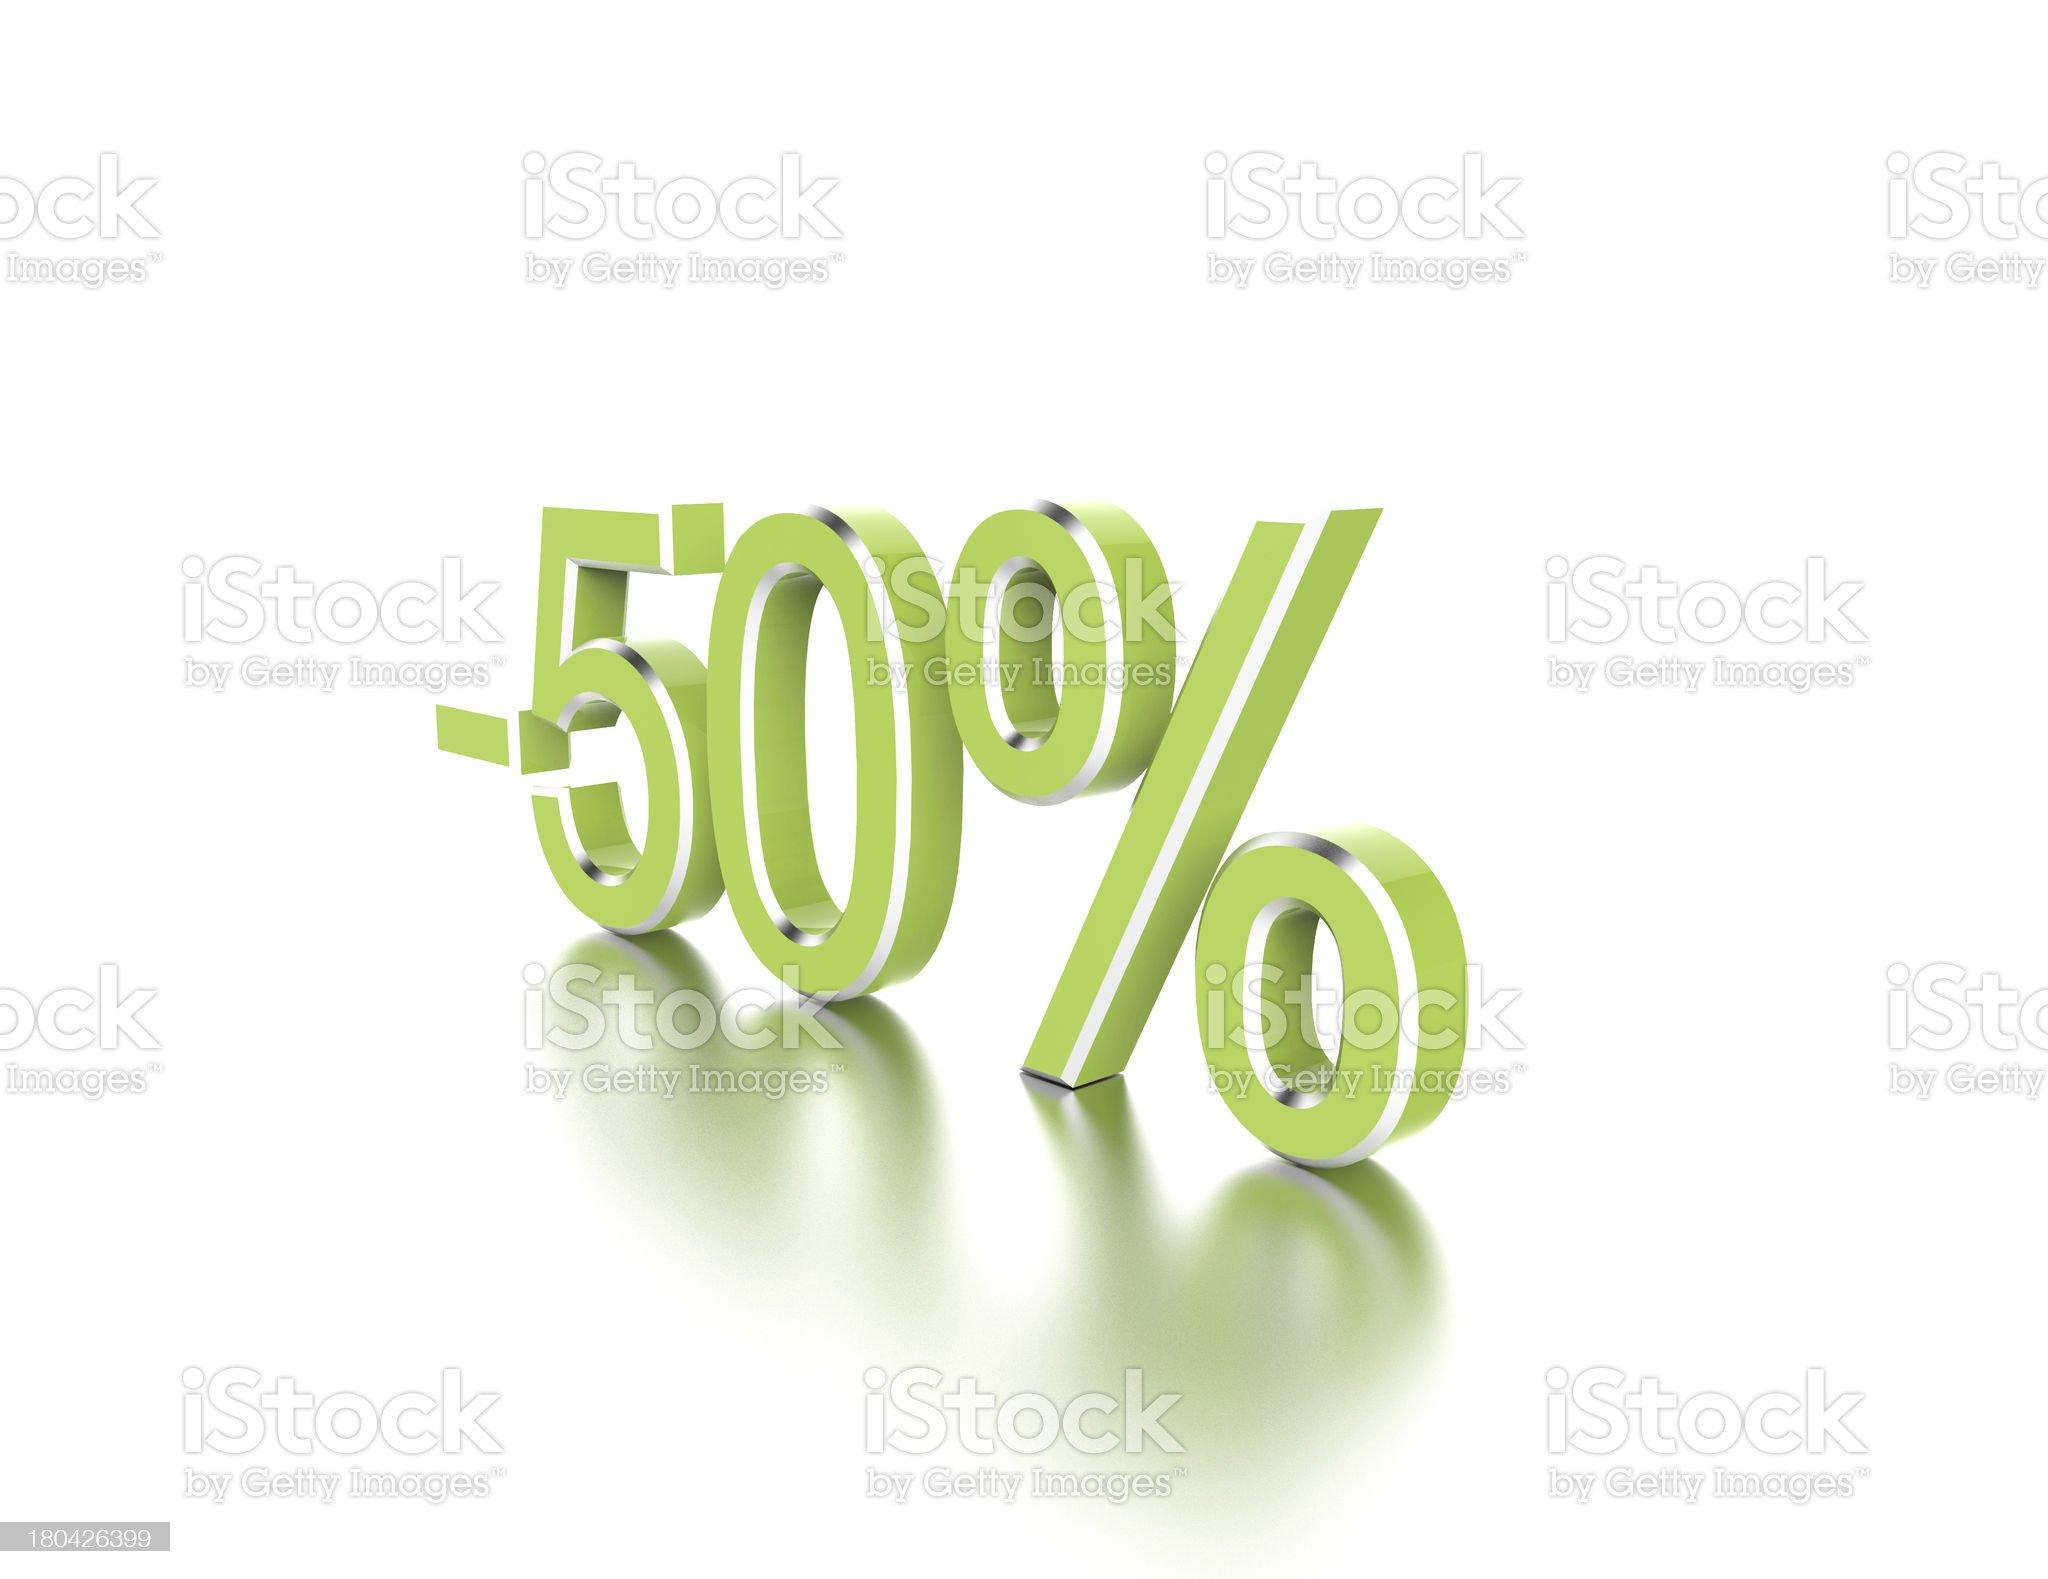 -50% royalty-free stock photo